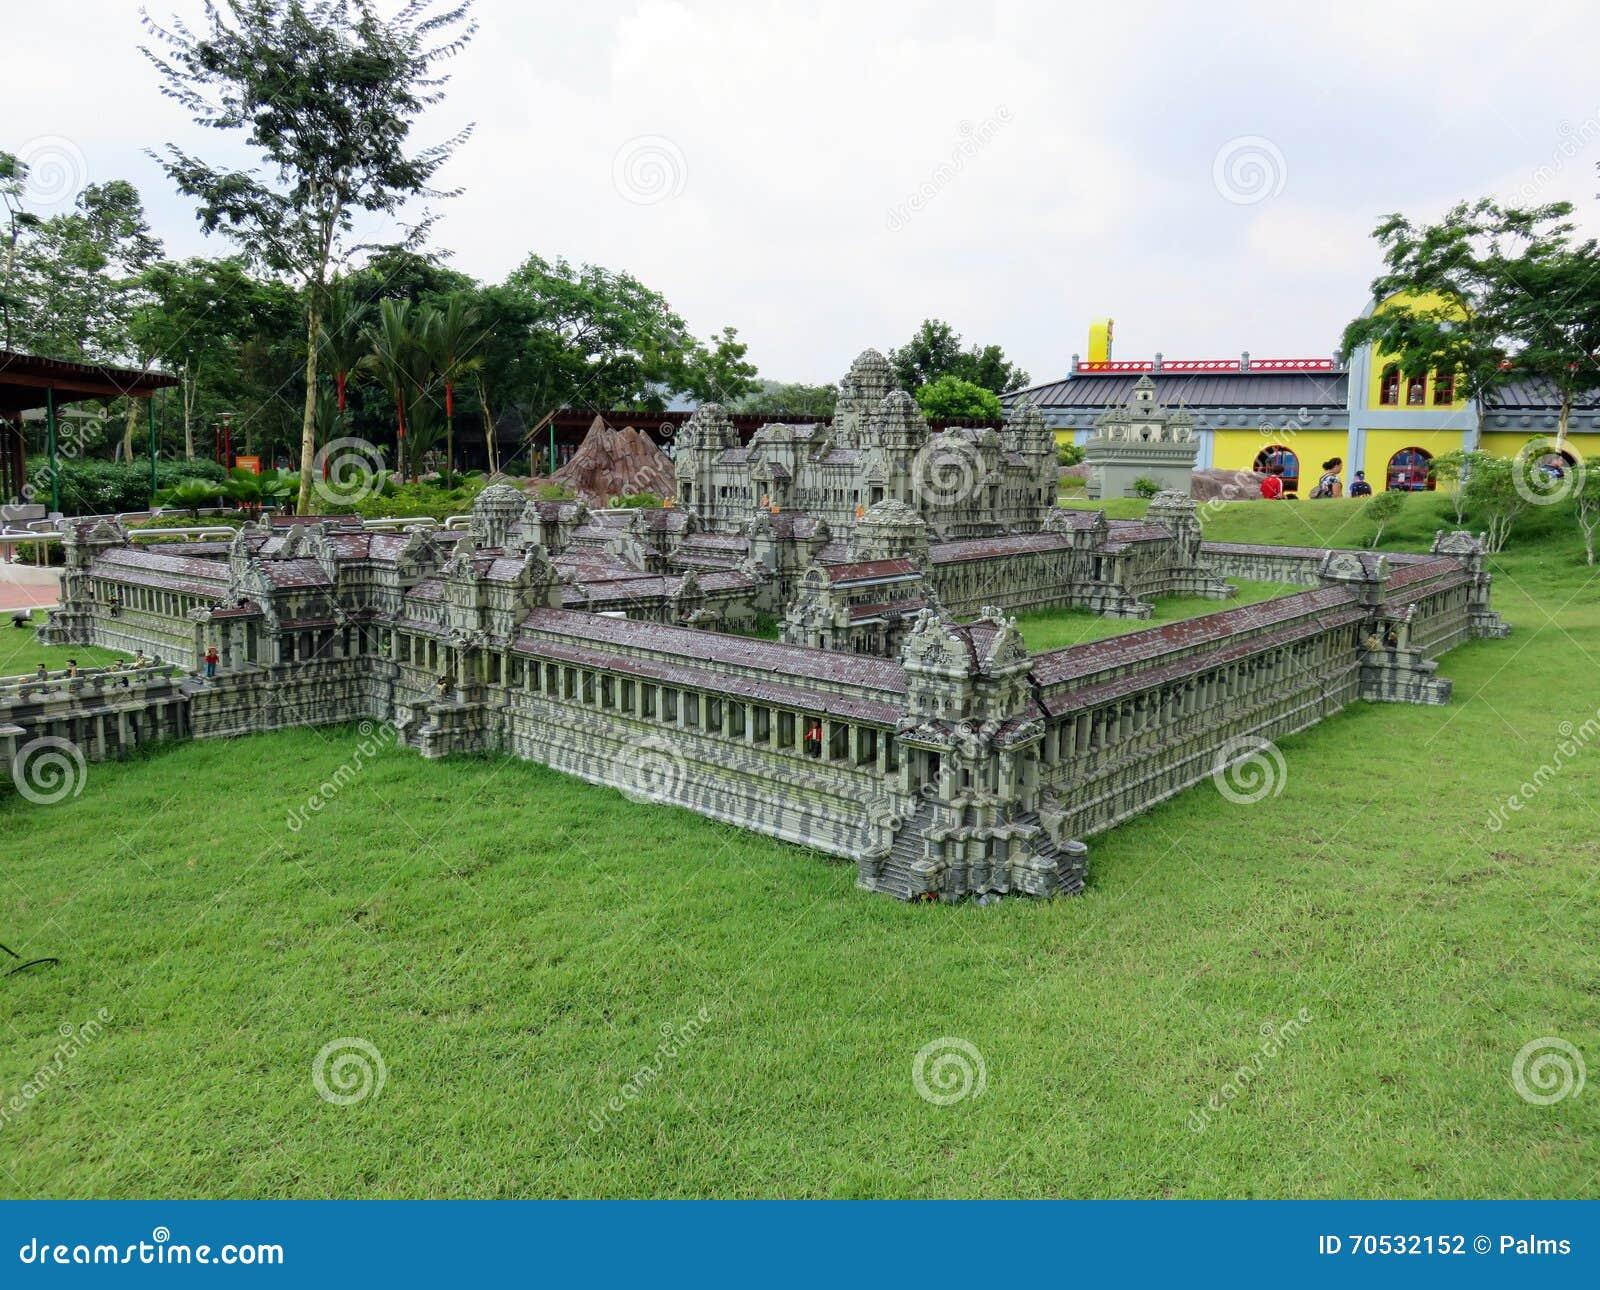 Centro turístico de Legoland Malasia